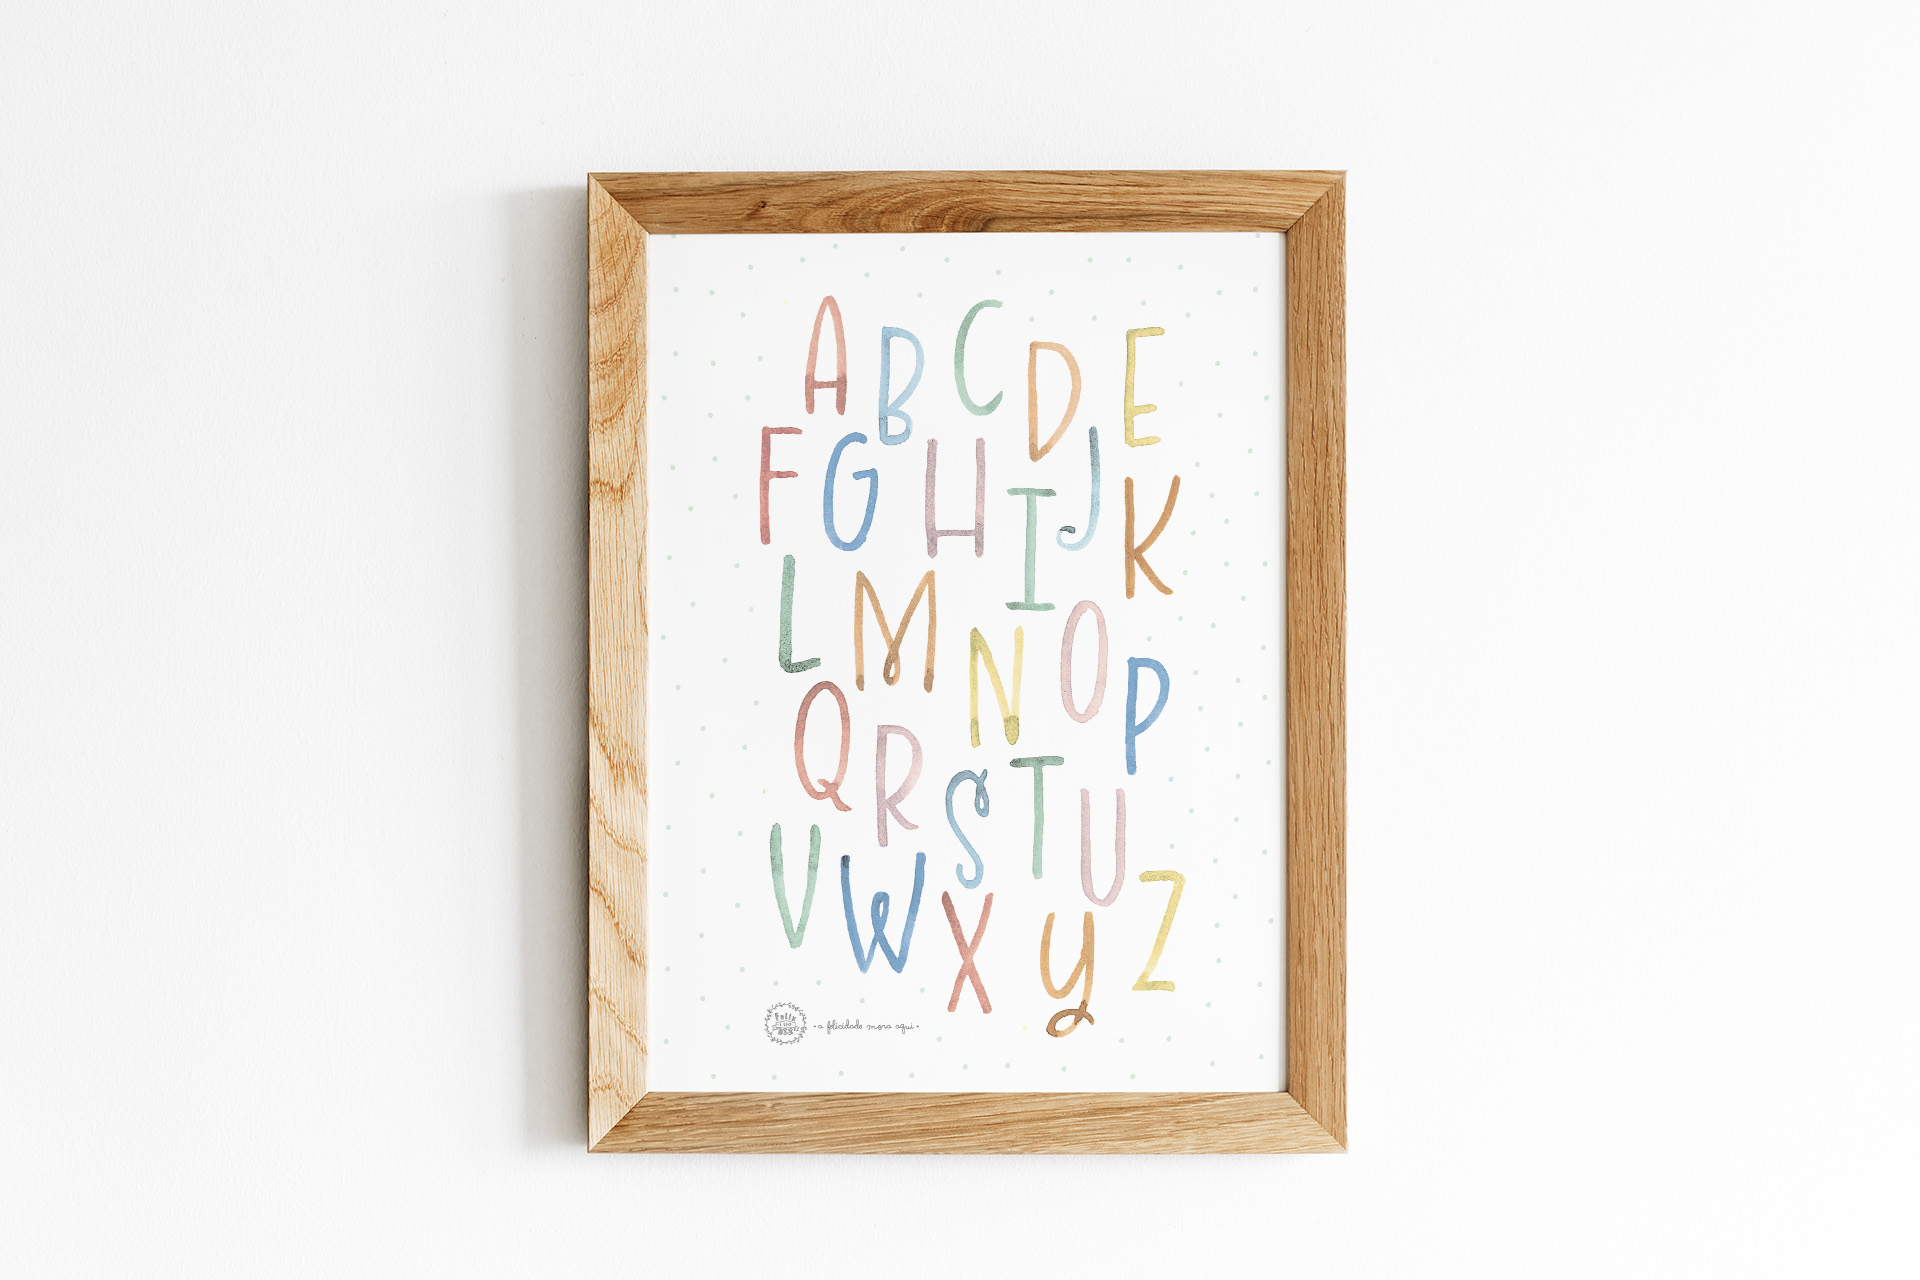 Art print . Letras